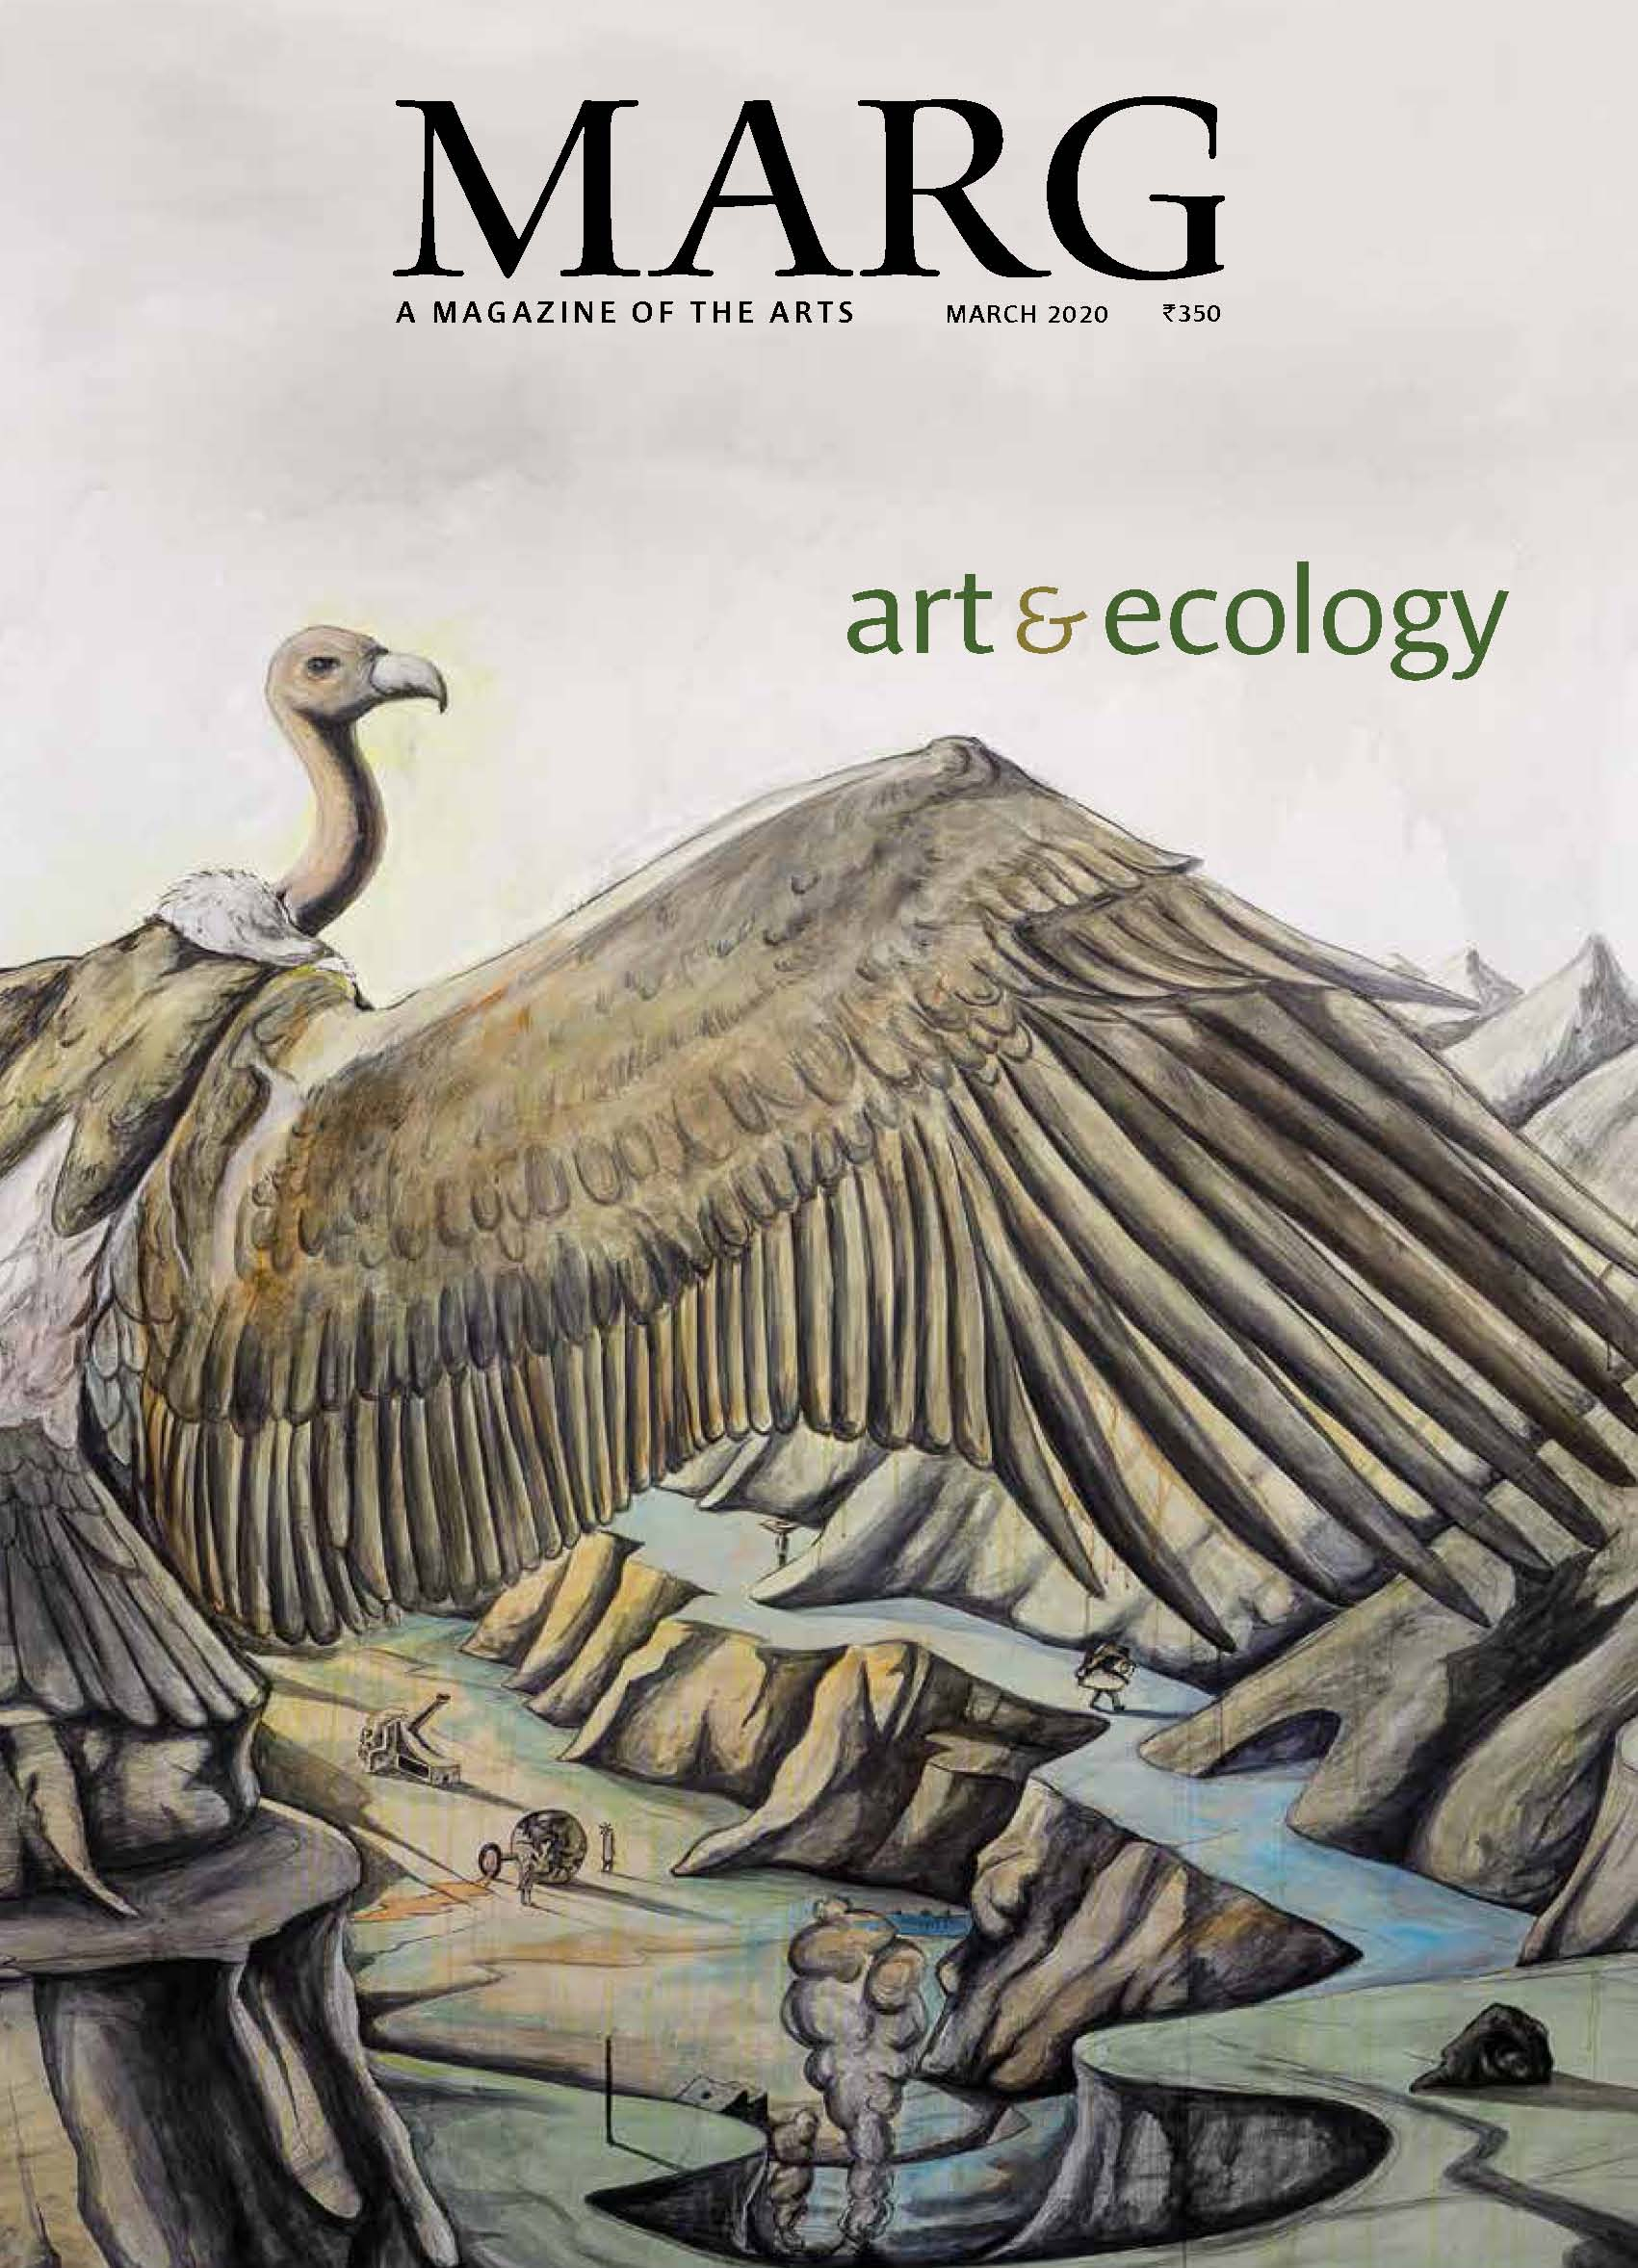 Art and Ecology (March 2020) — Marg Magazine — Co-edited by Ravi Agarwal and Latika Gupta